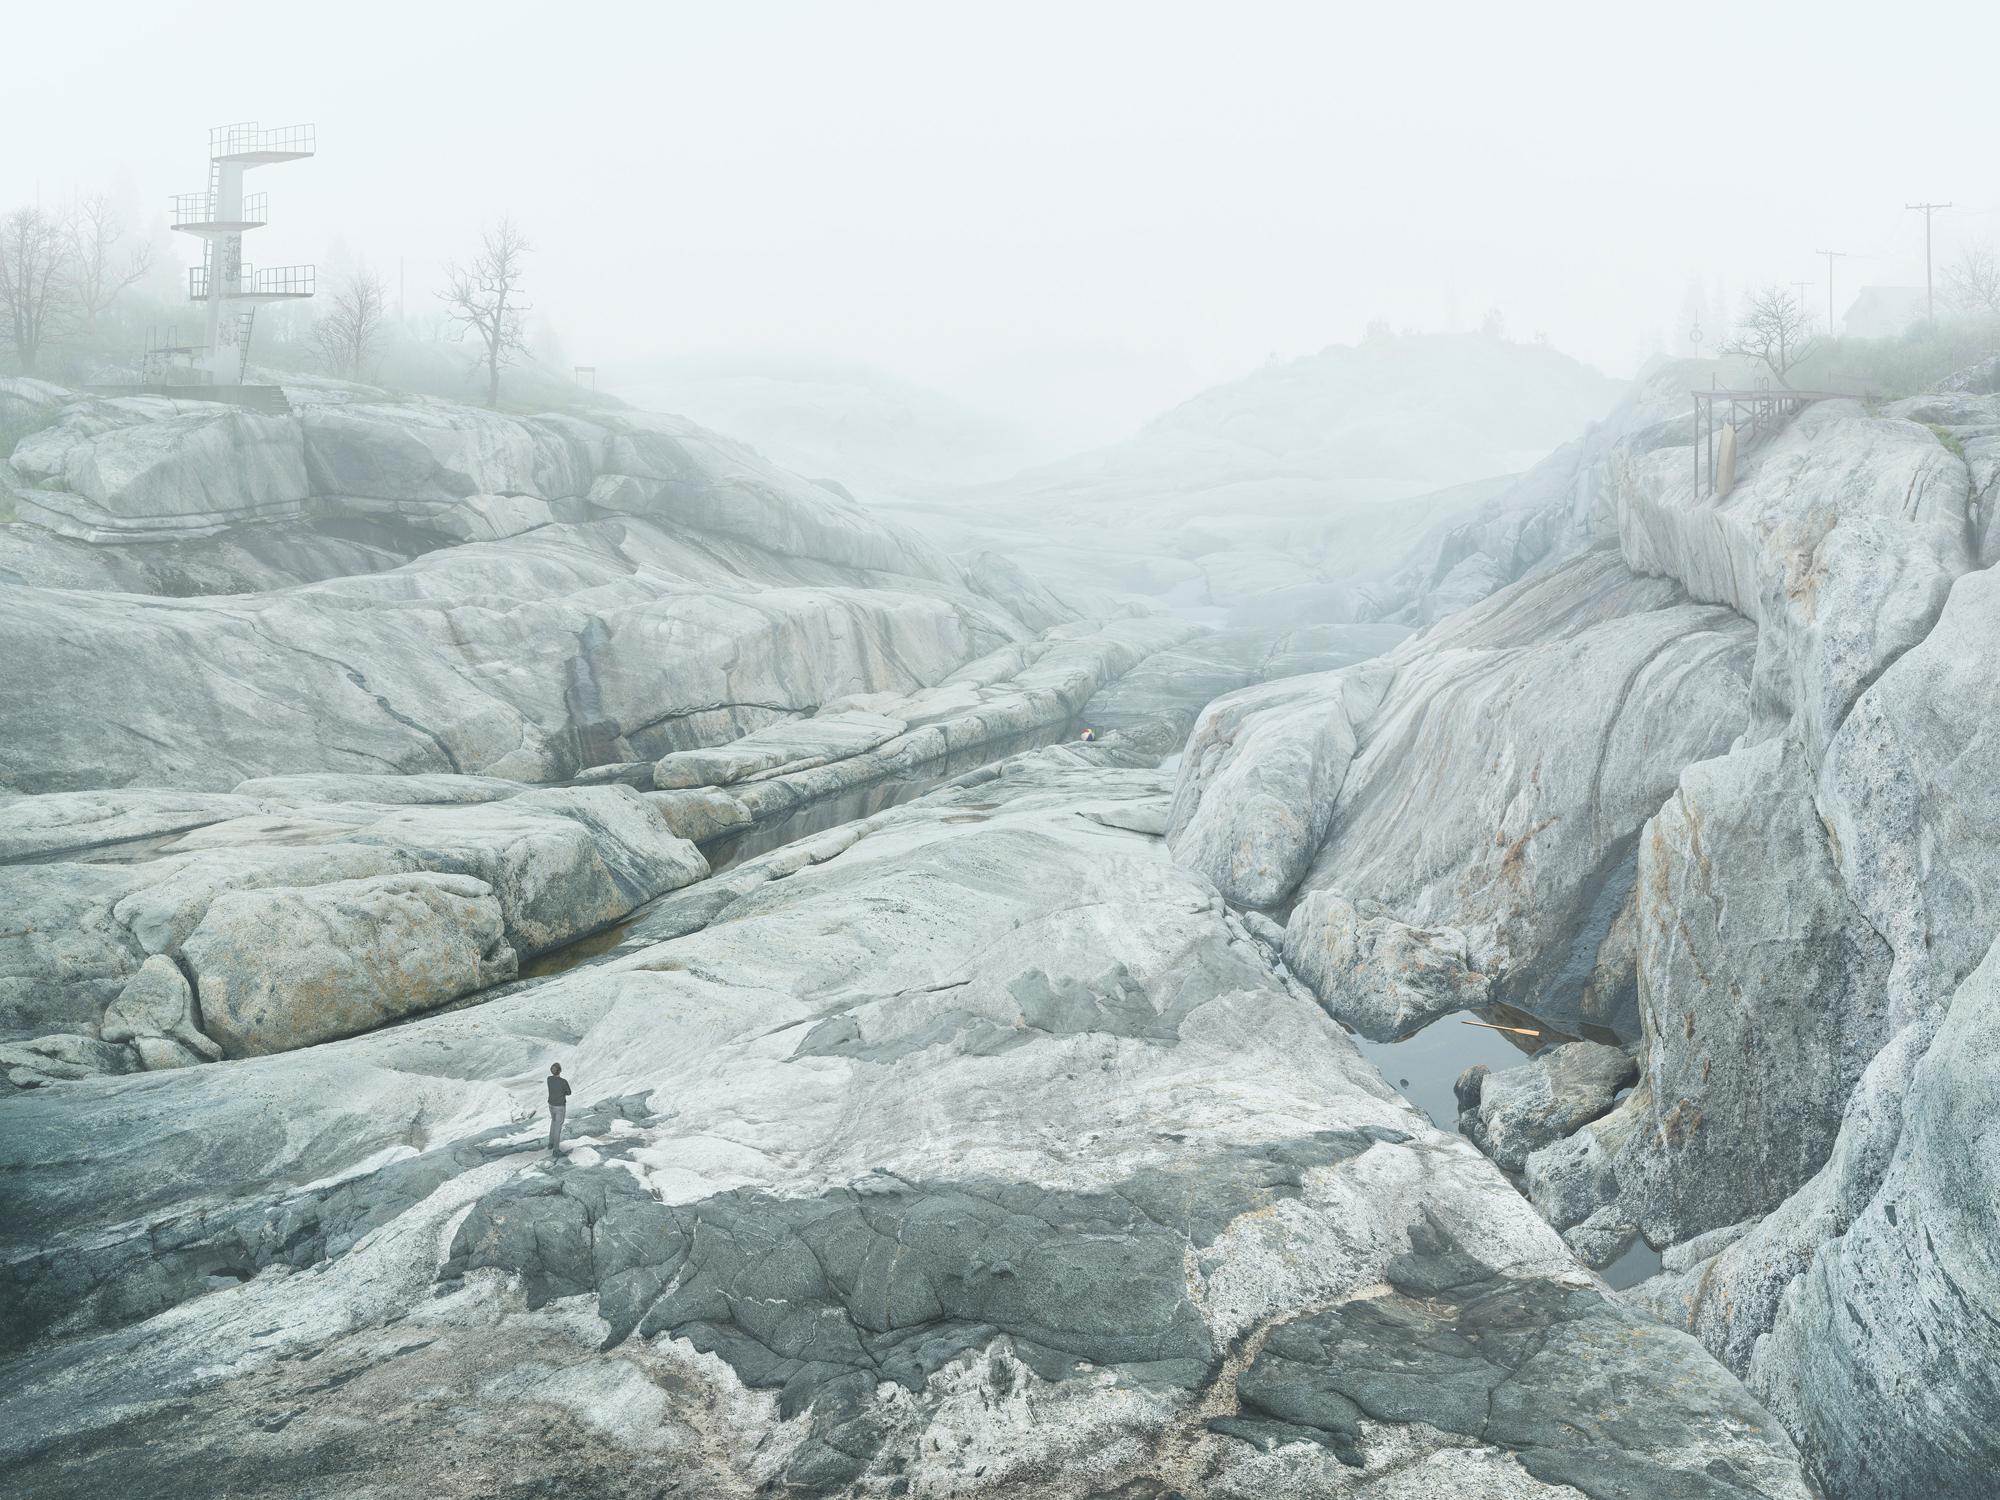 Drained Memories | Erik Johansson